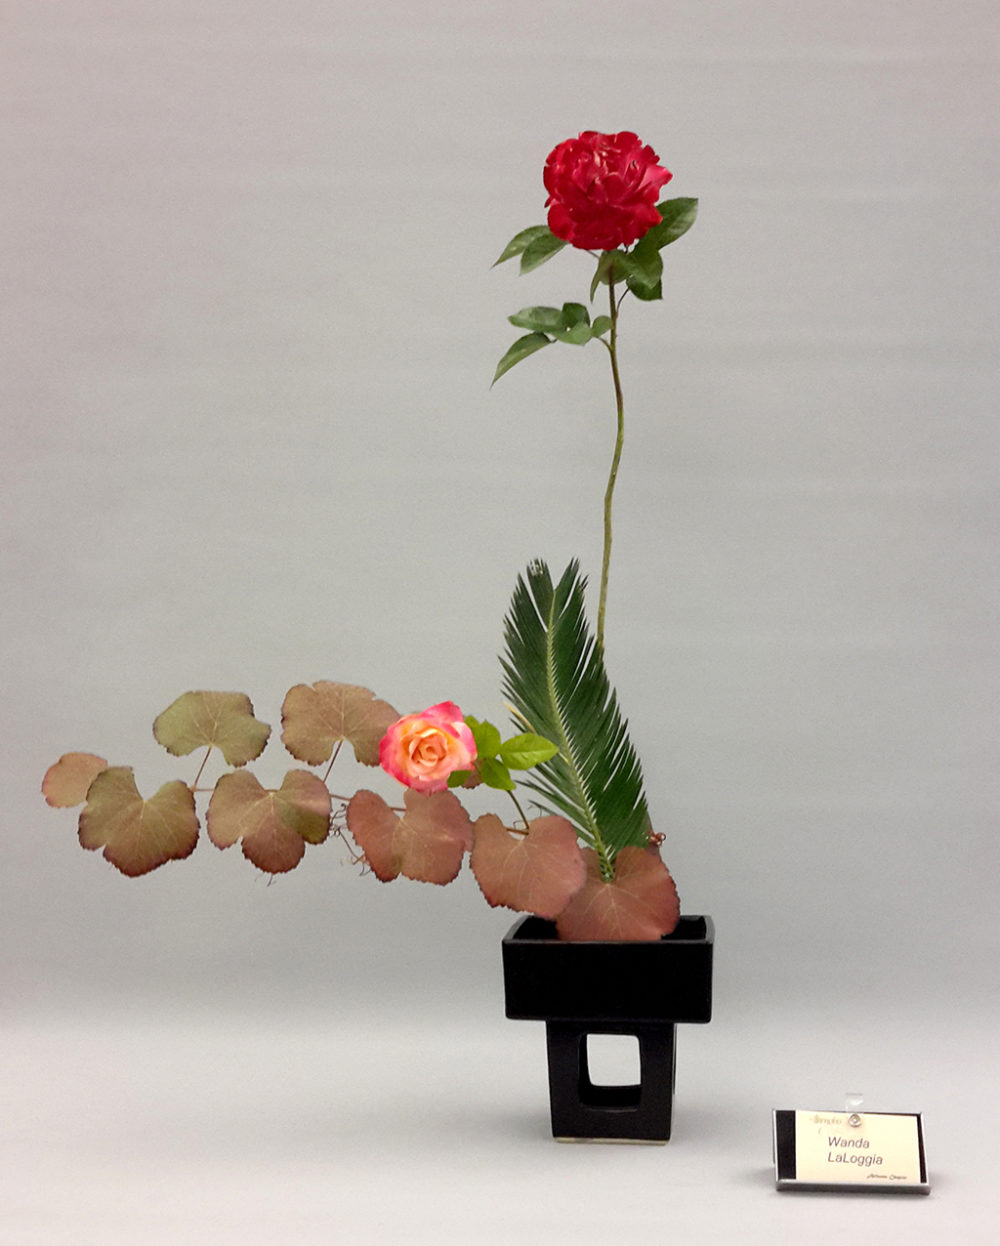 Rose Garden Workshop (Dec 16, 2017)